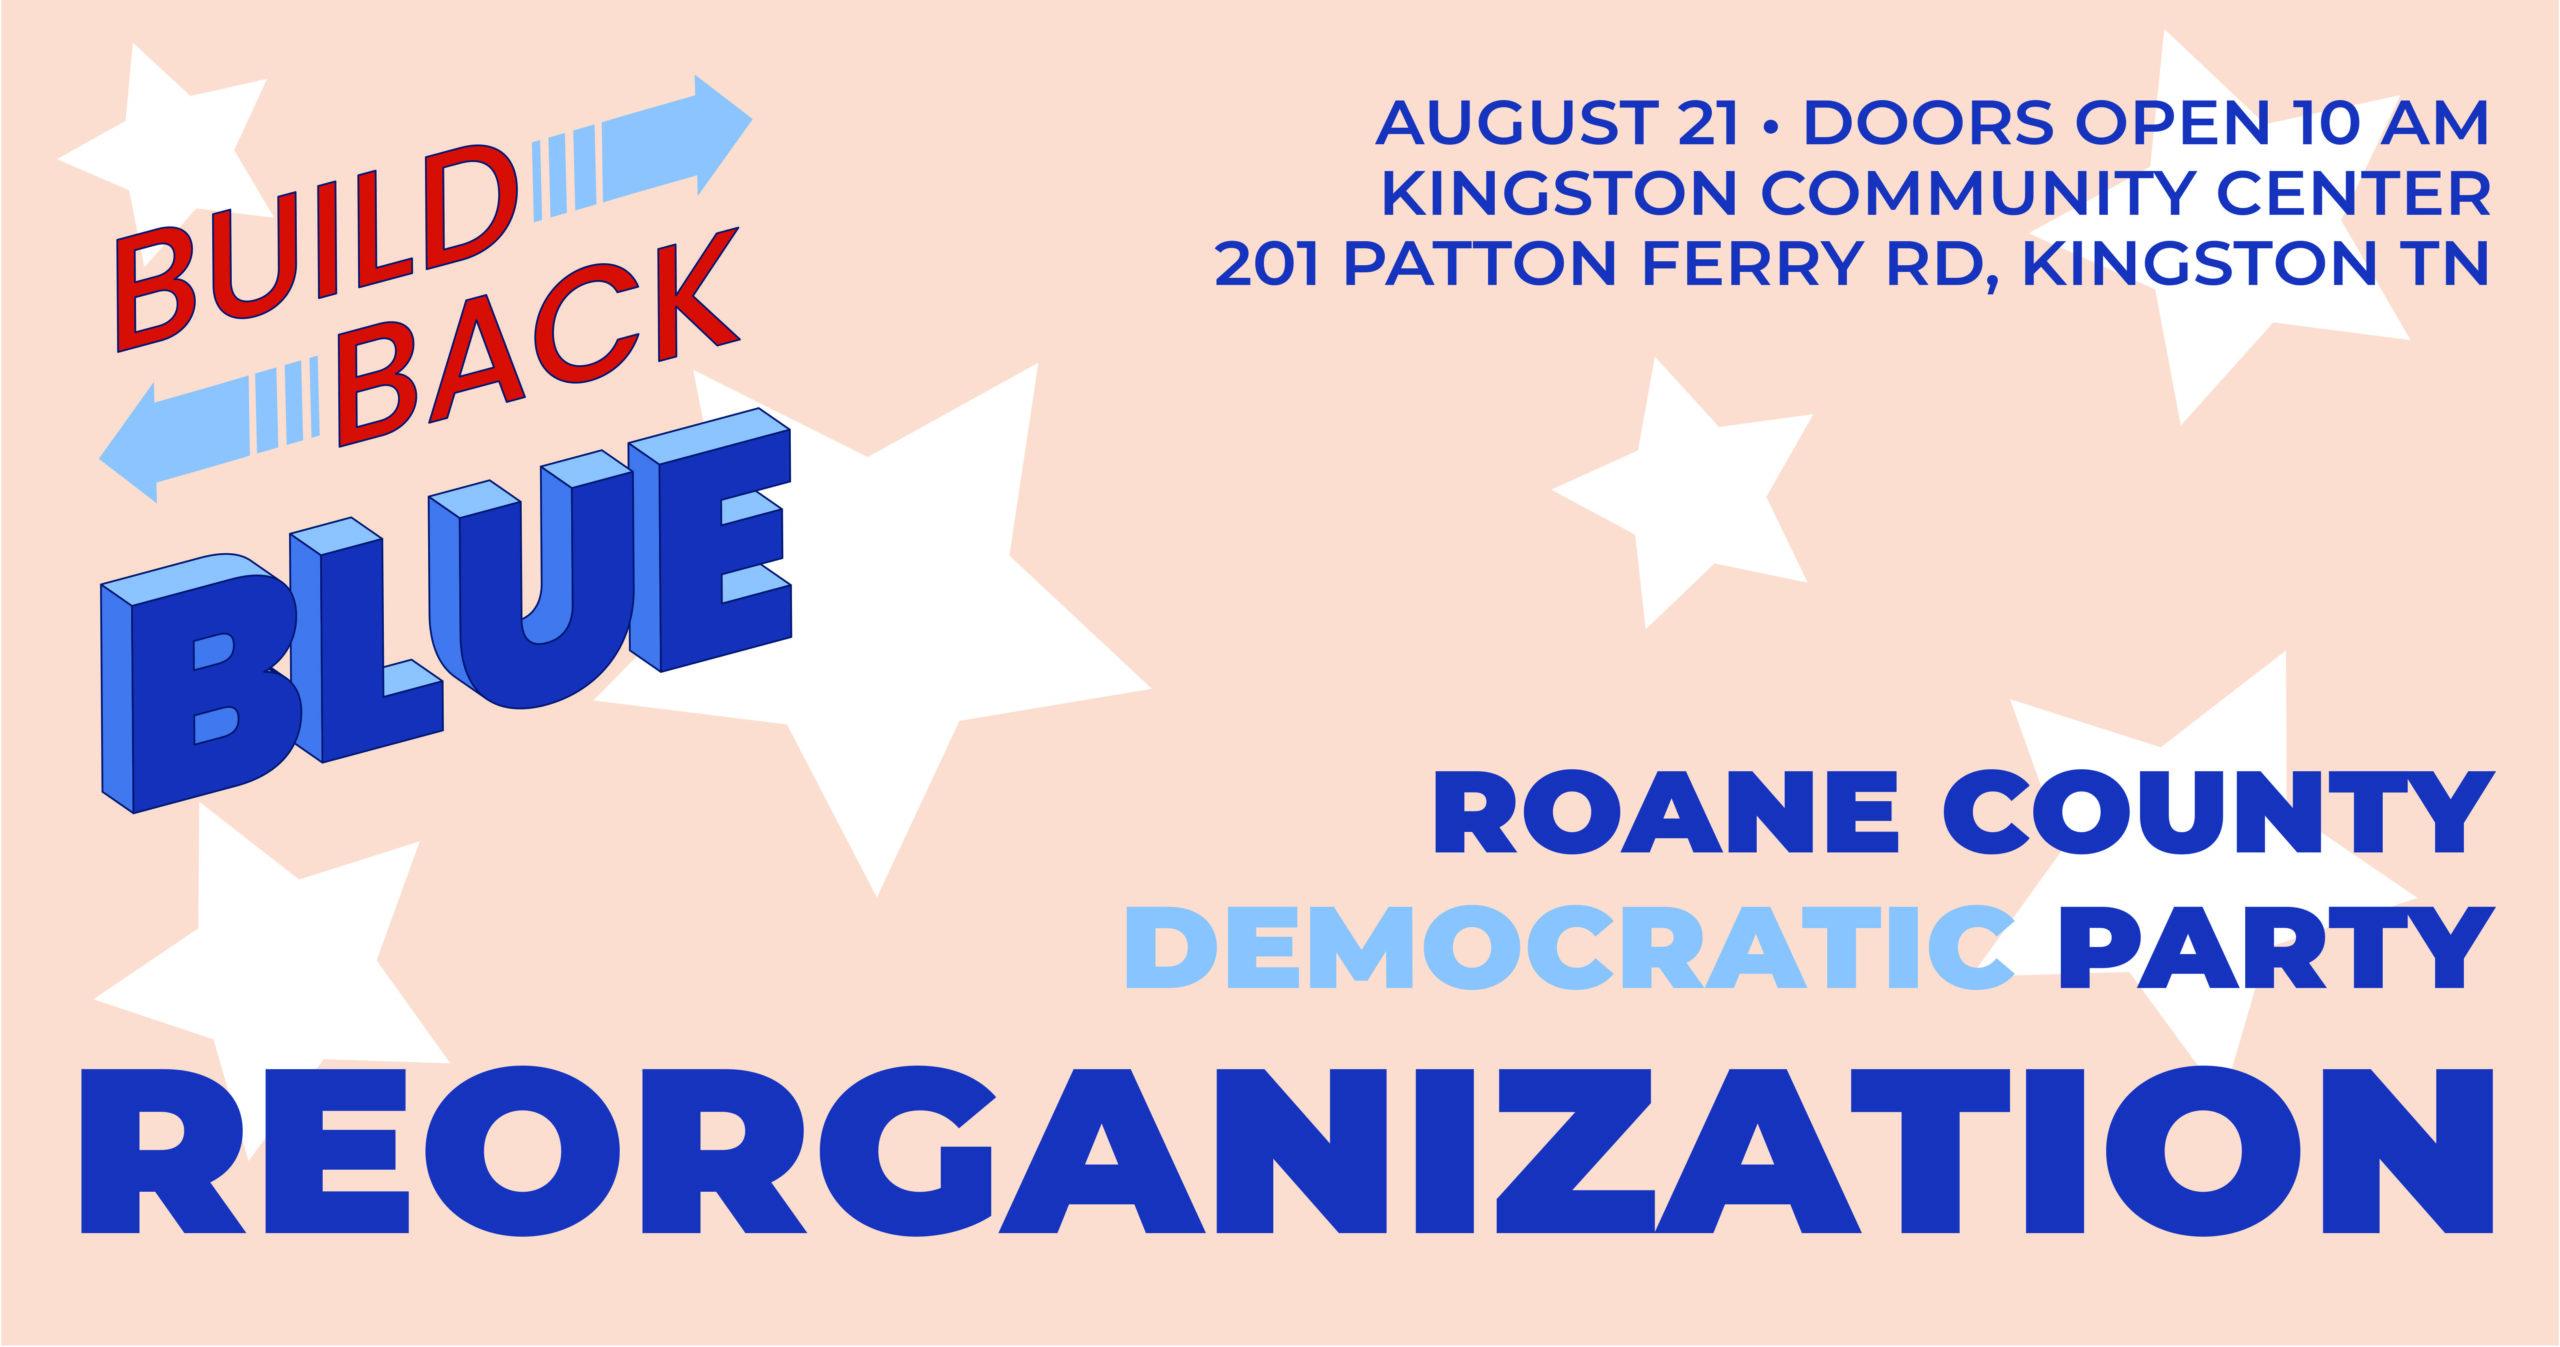 RCDP reorganization